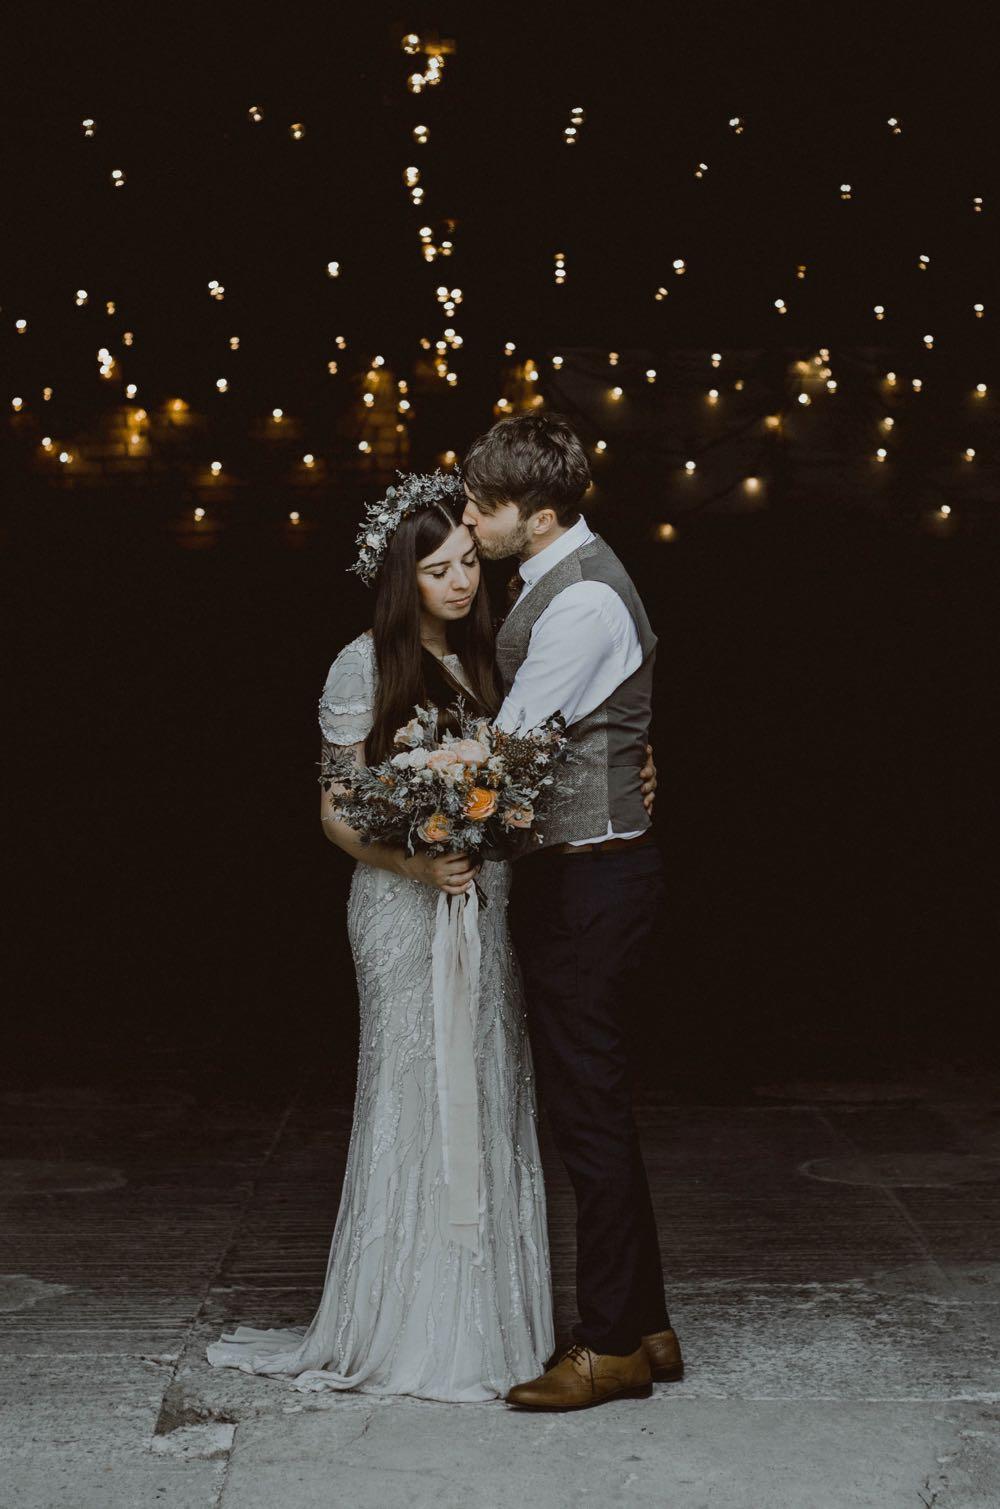 Wistful-Wedding-2